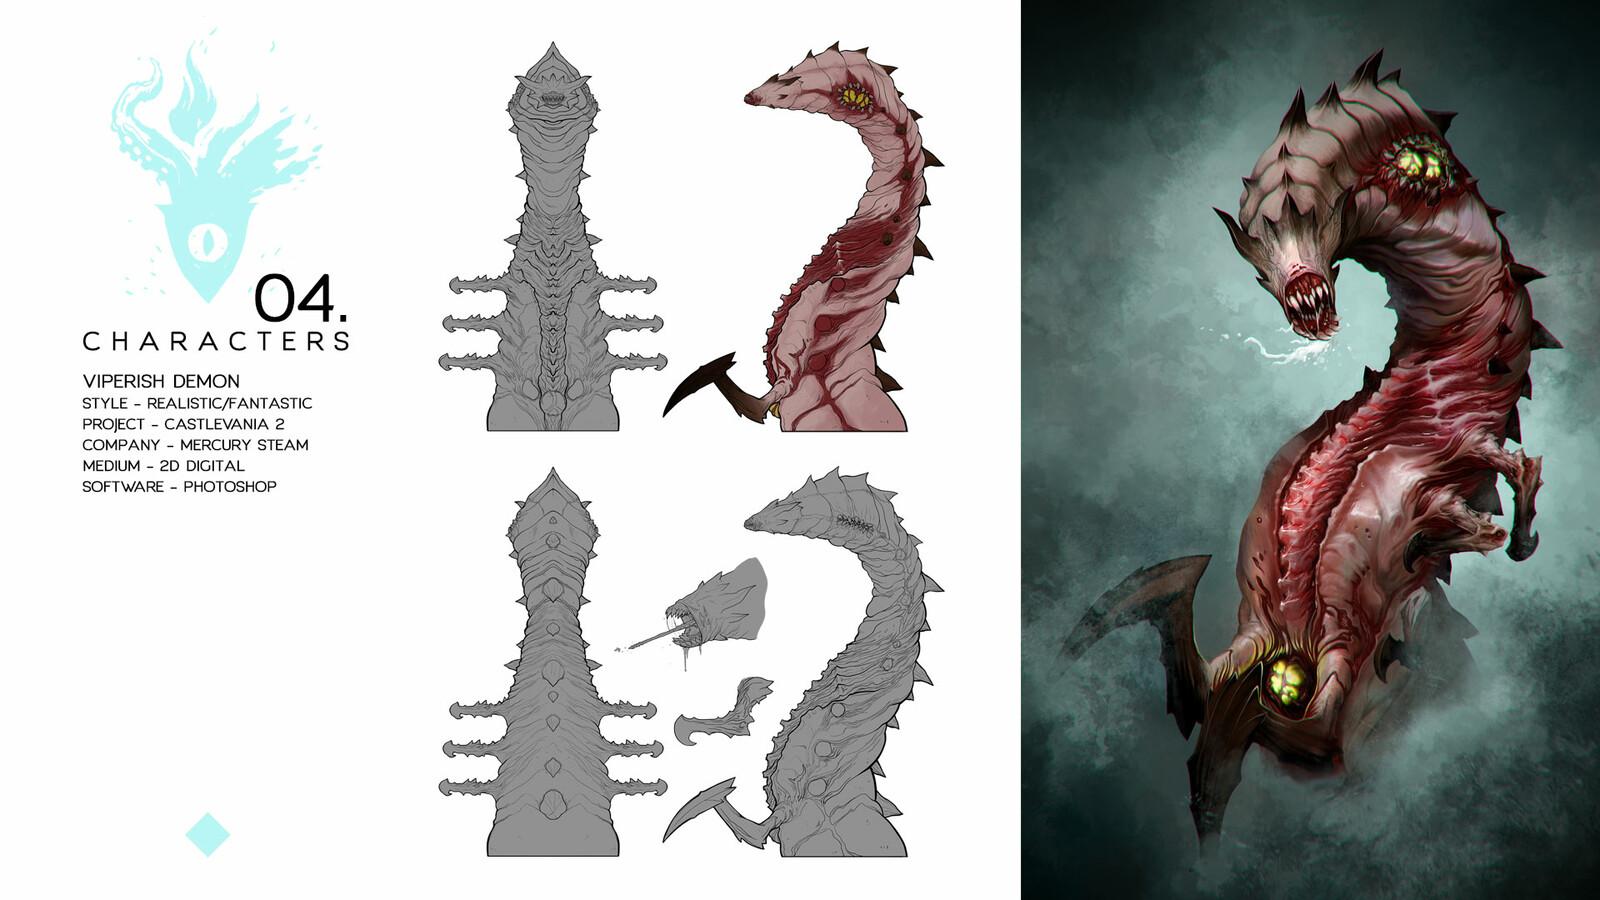 Viperish Demon - Castlevania Lord of Shadows II